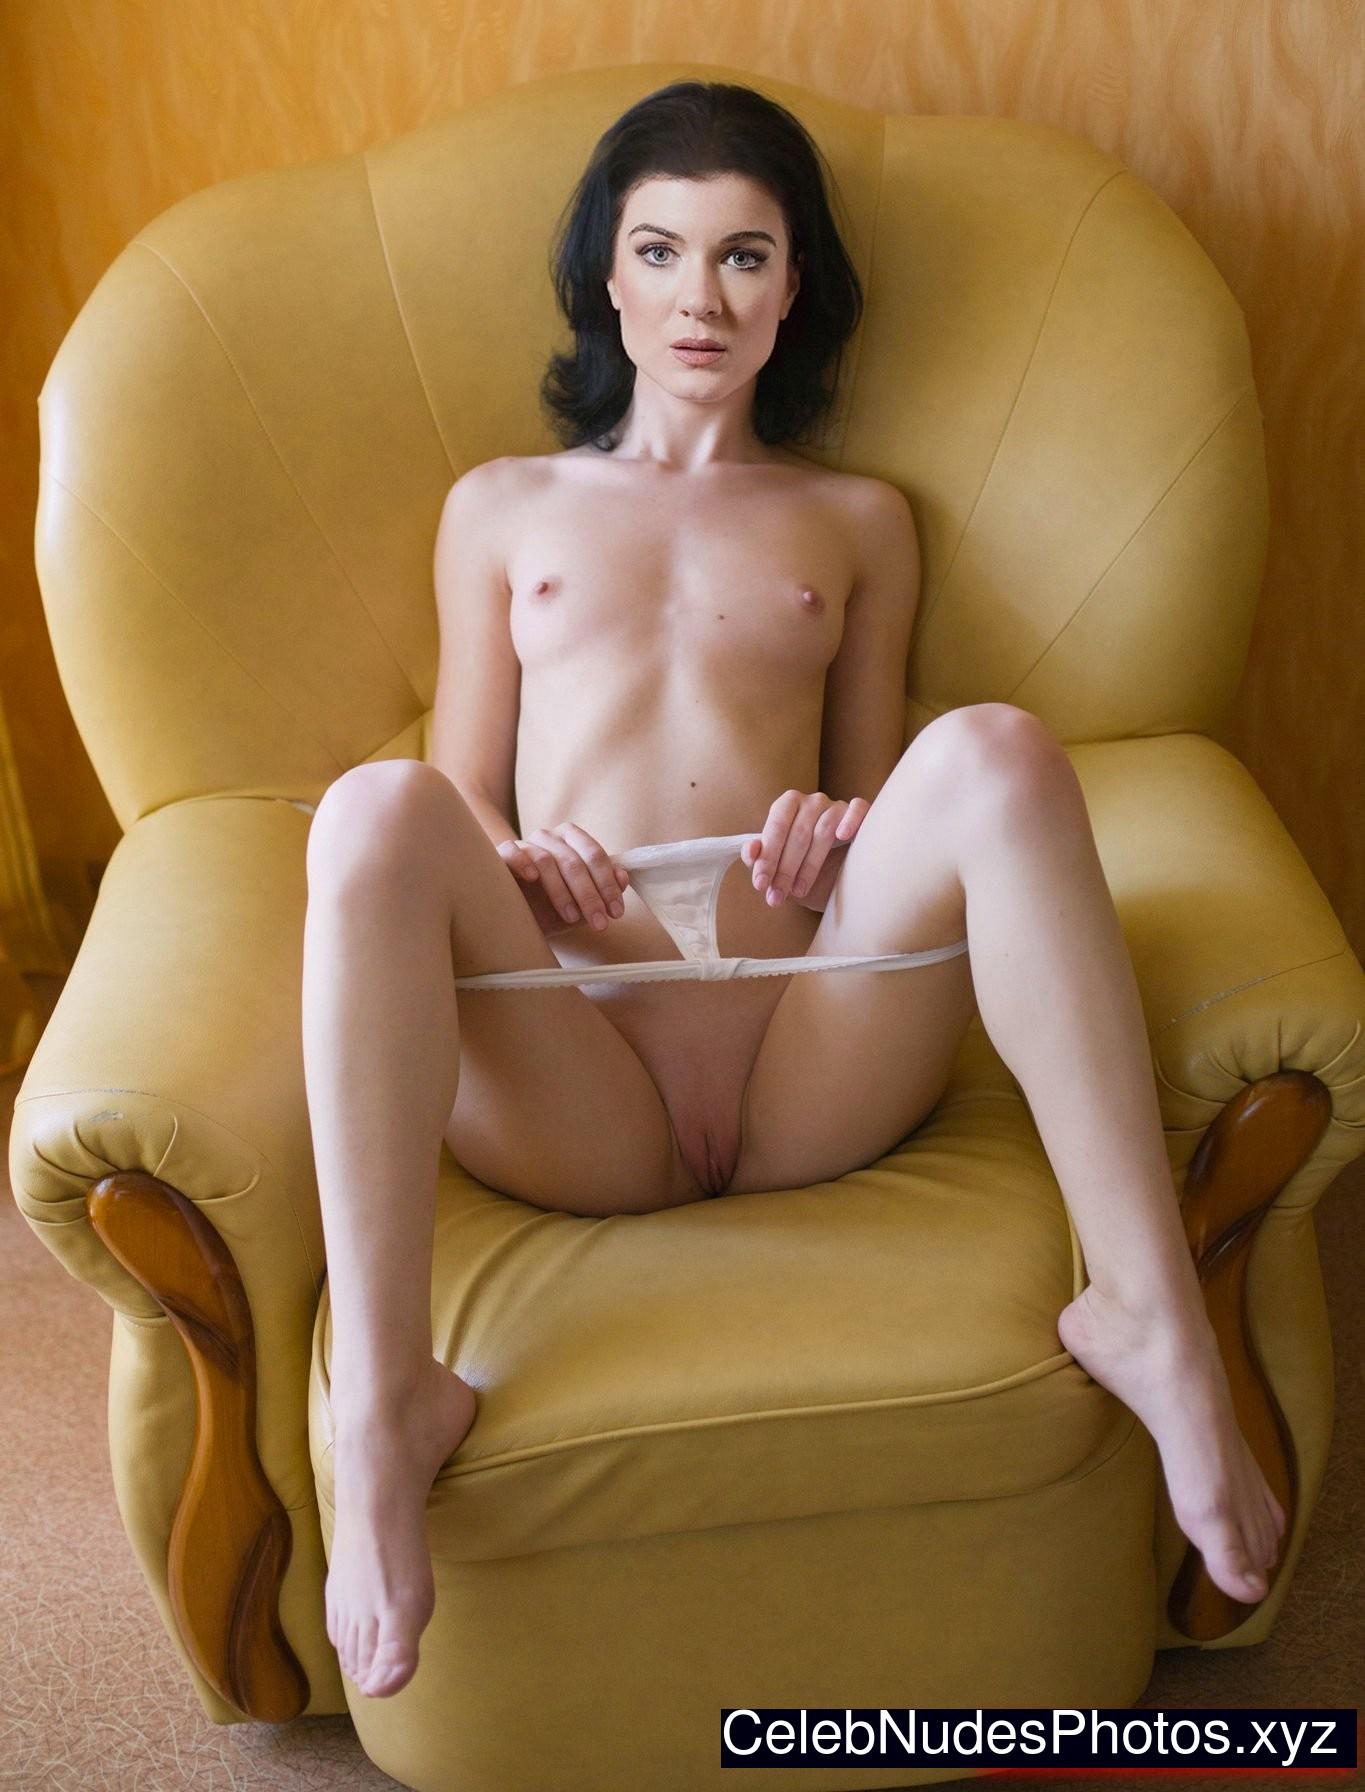 gabrielle miller naked